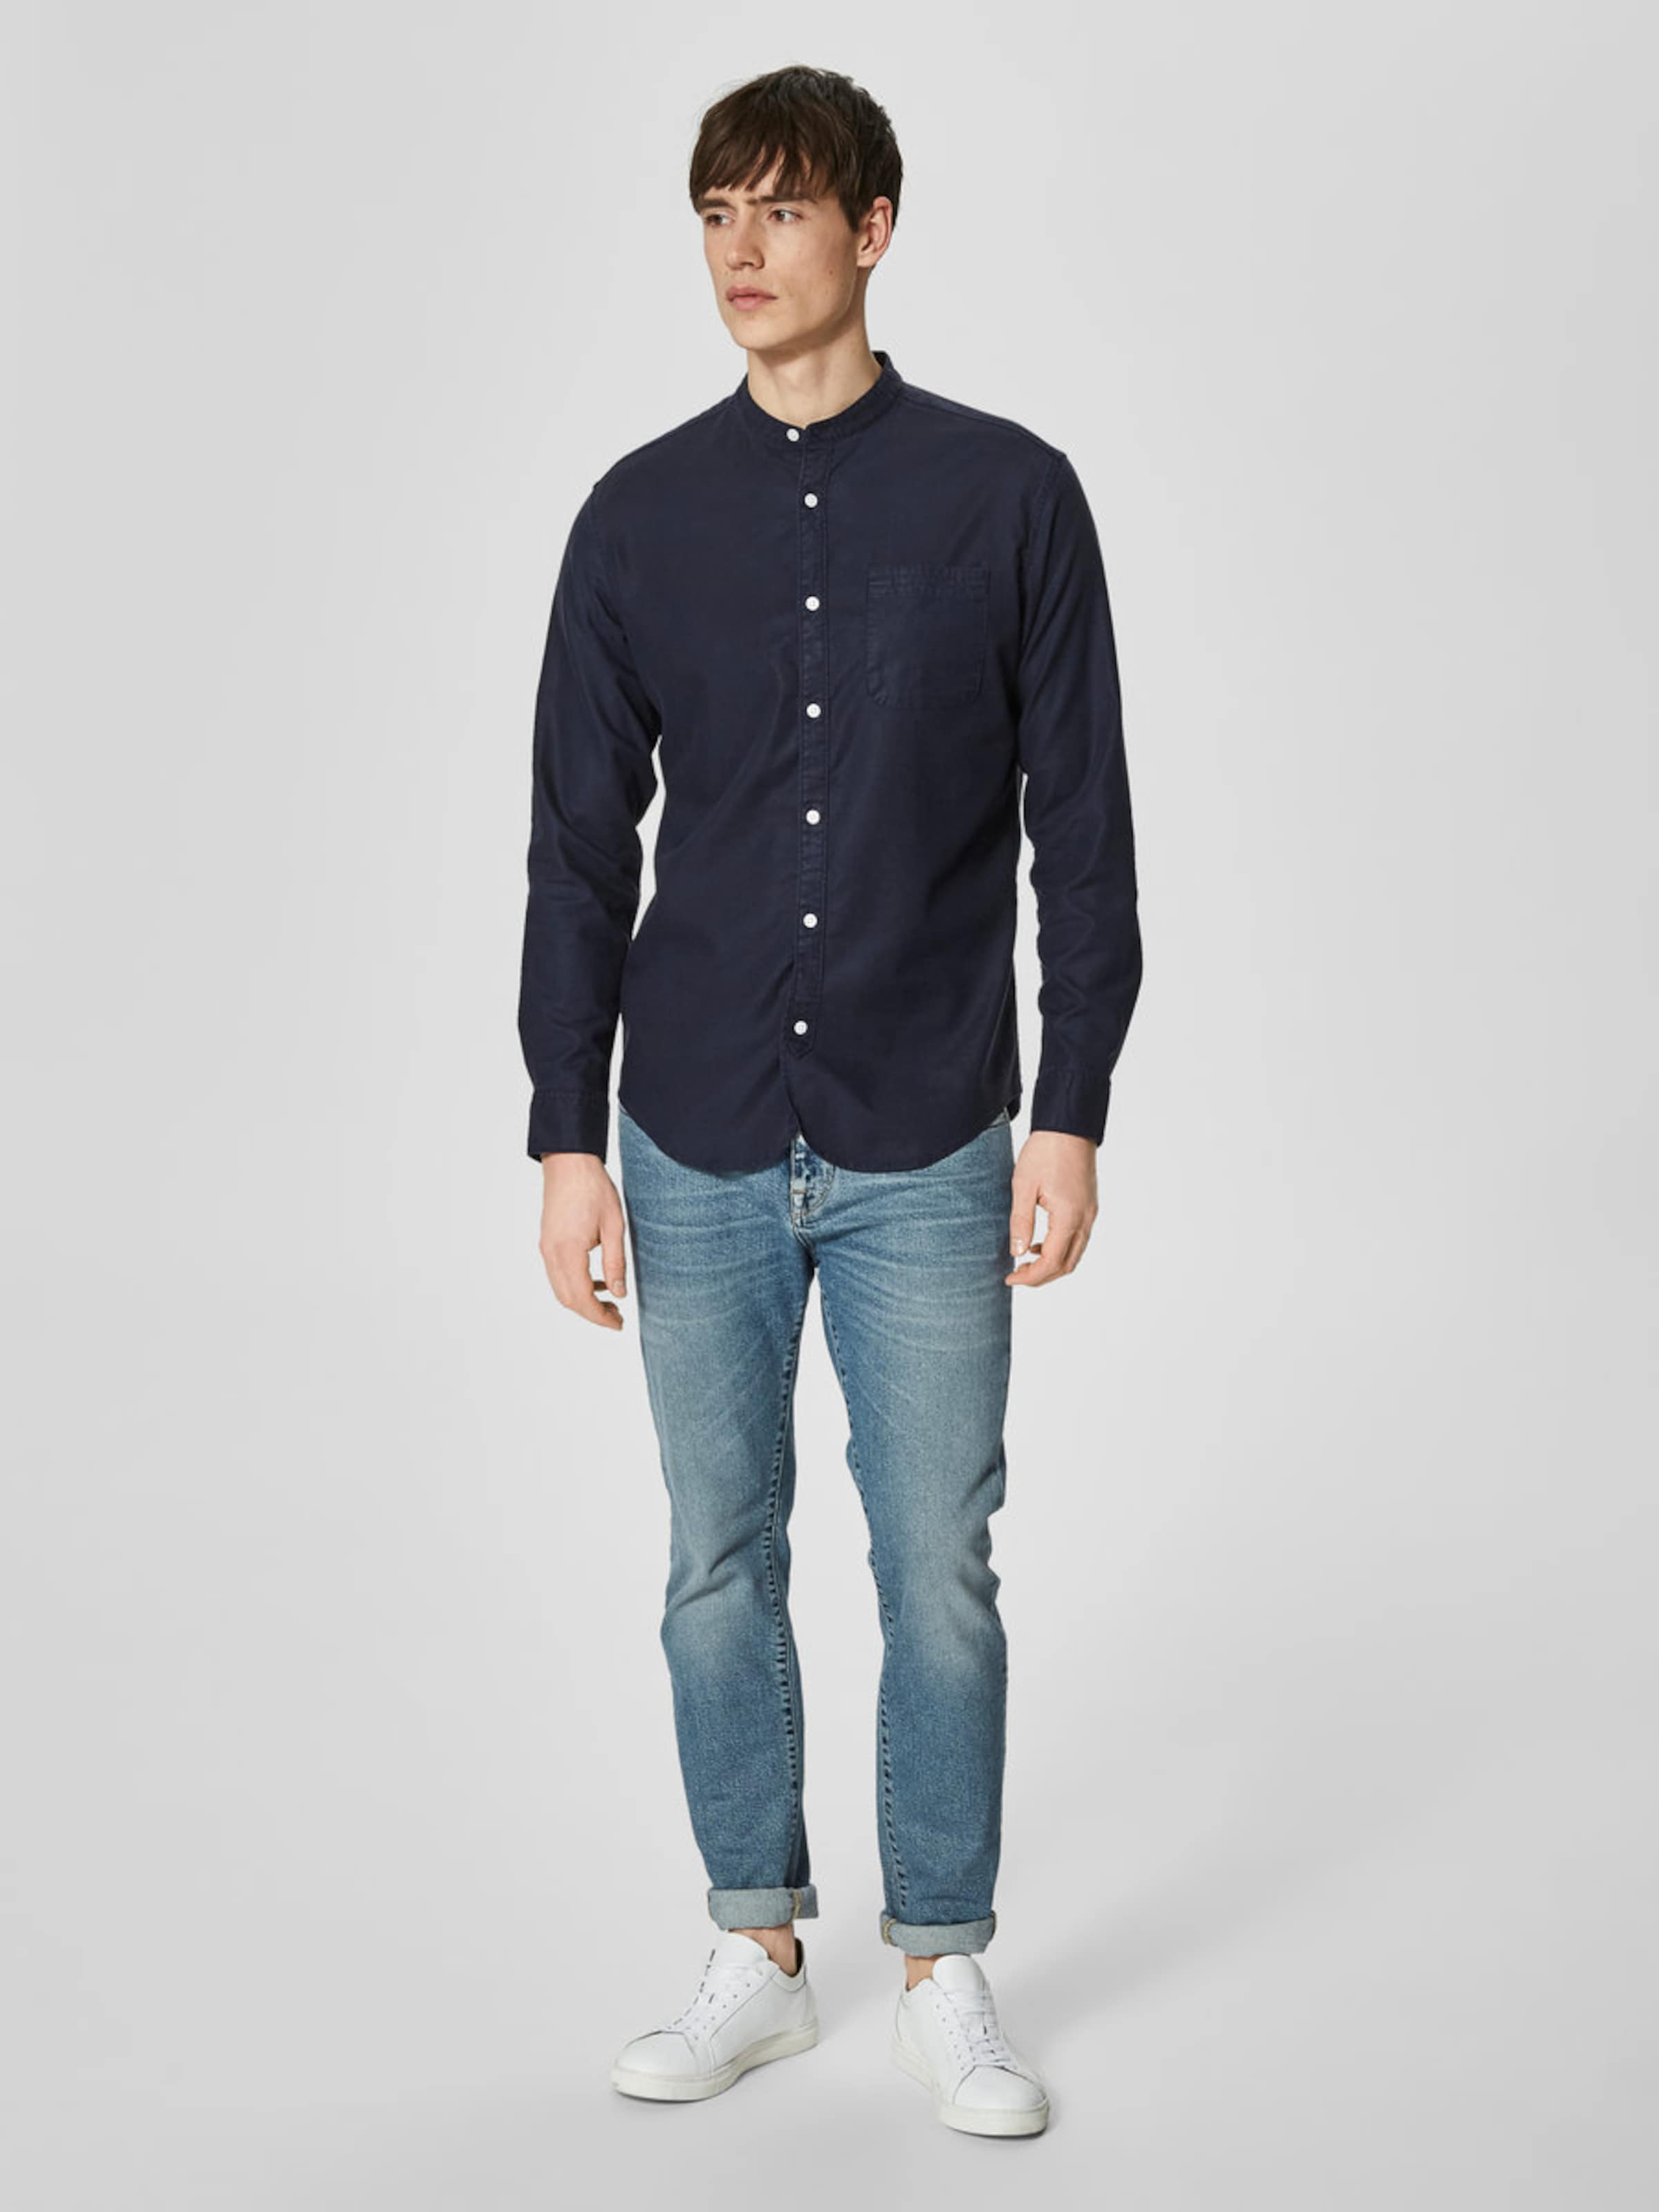 SELECTED HOMME Mandarinkragen Slim Fit Hemd Bekommen UoItK8H